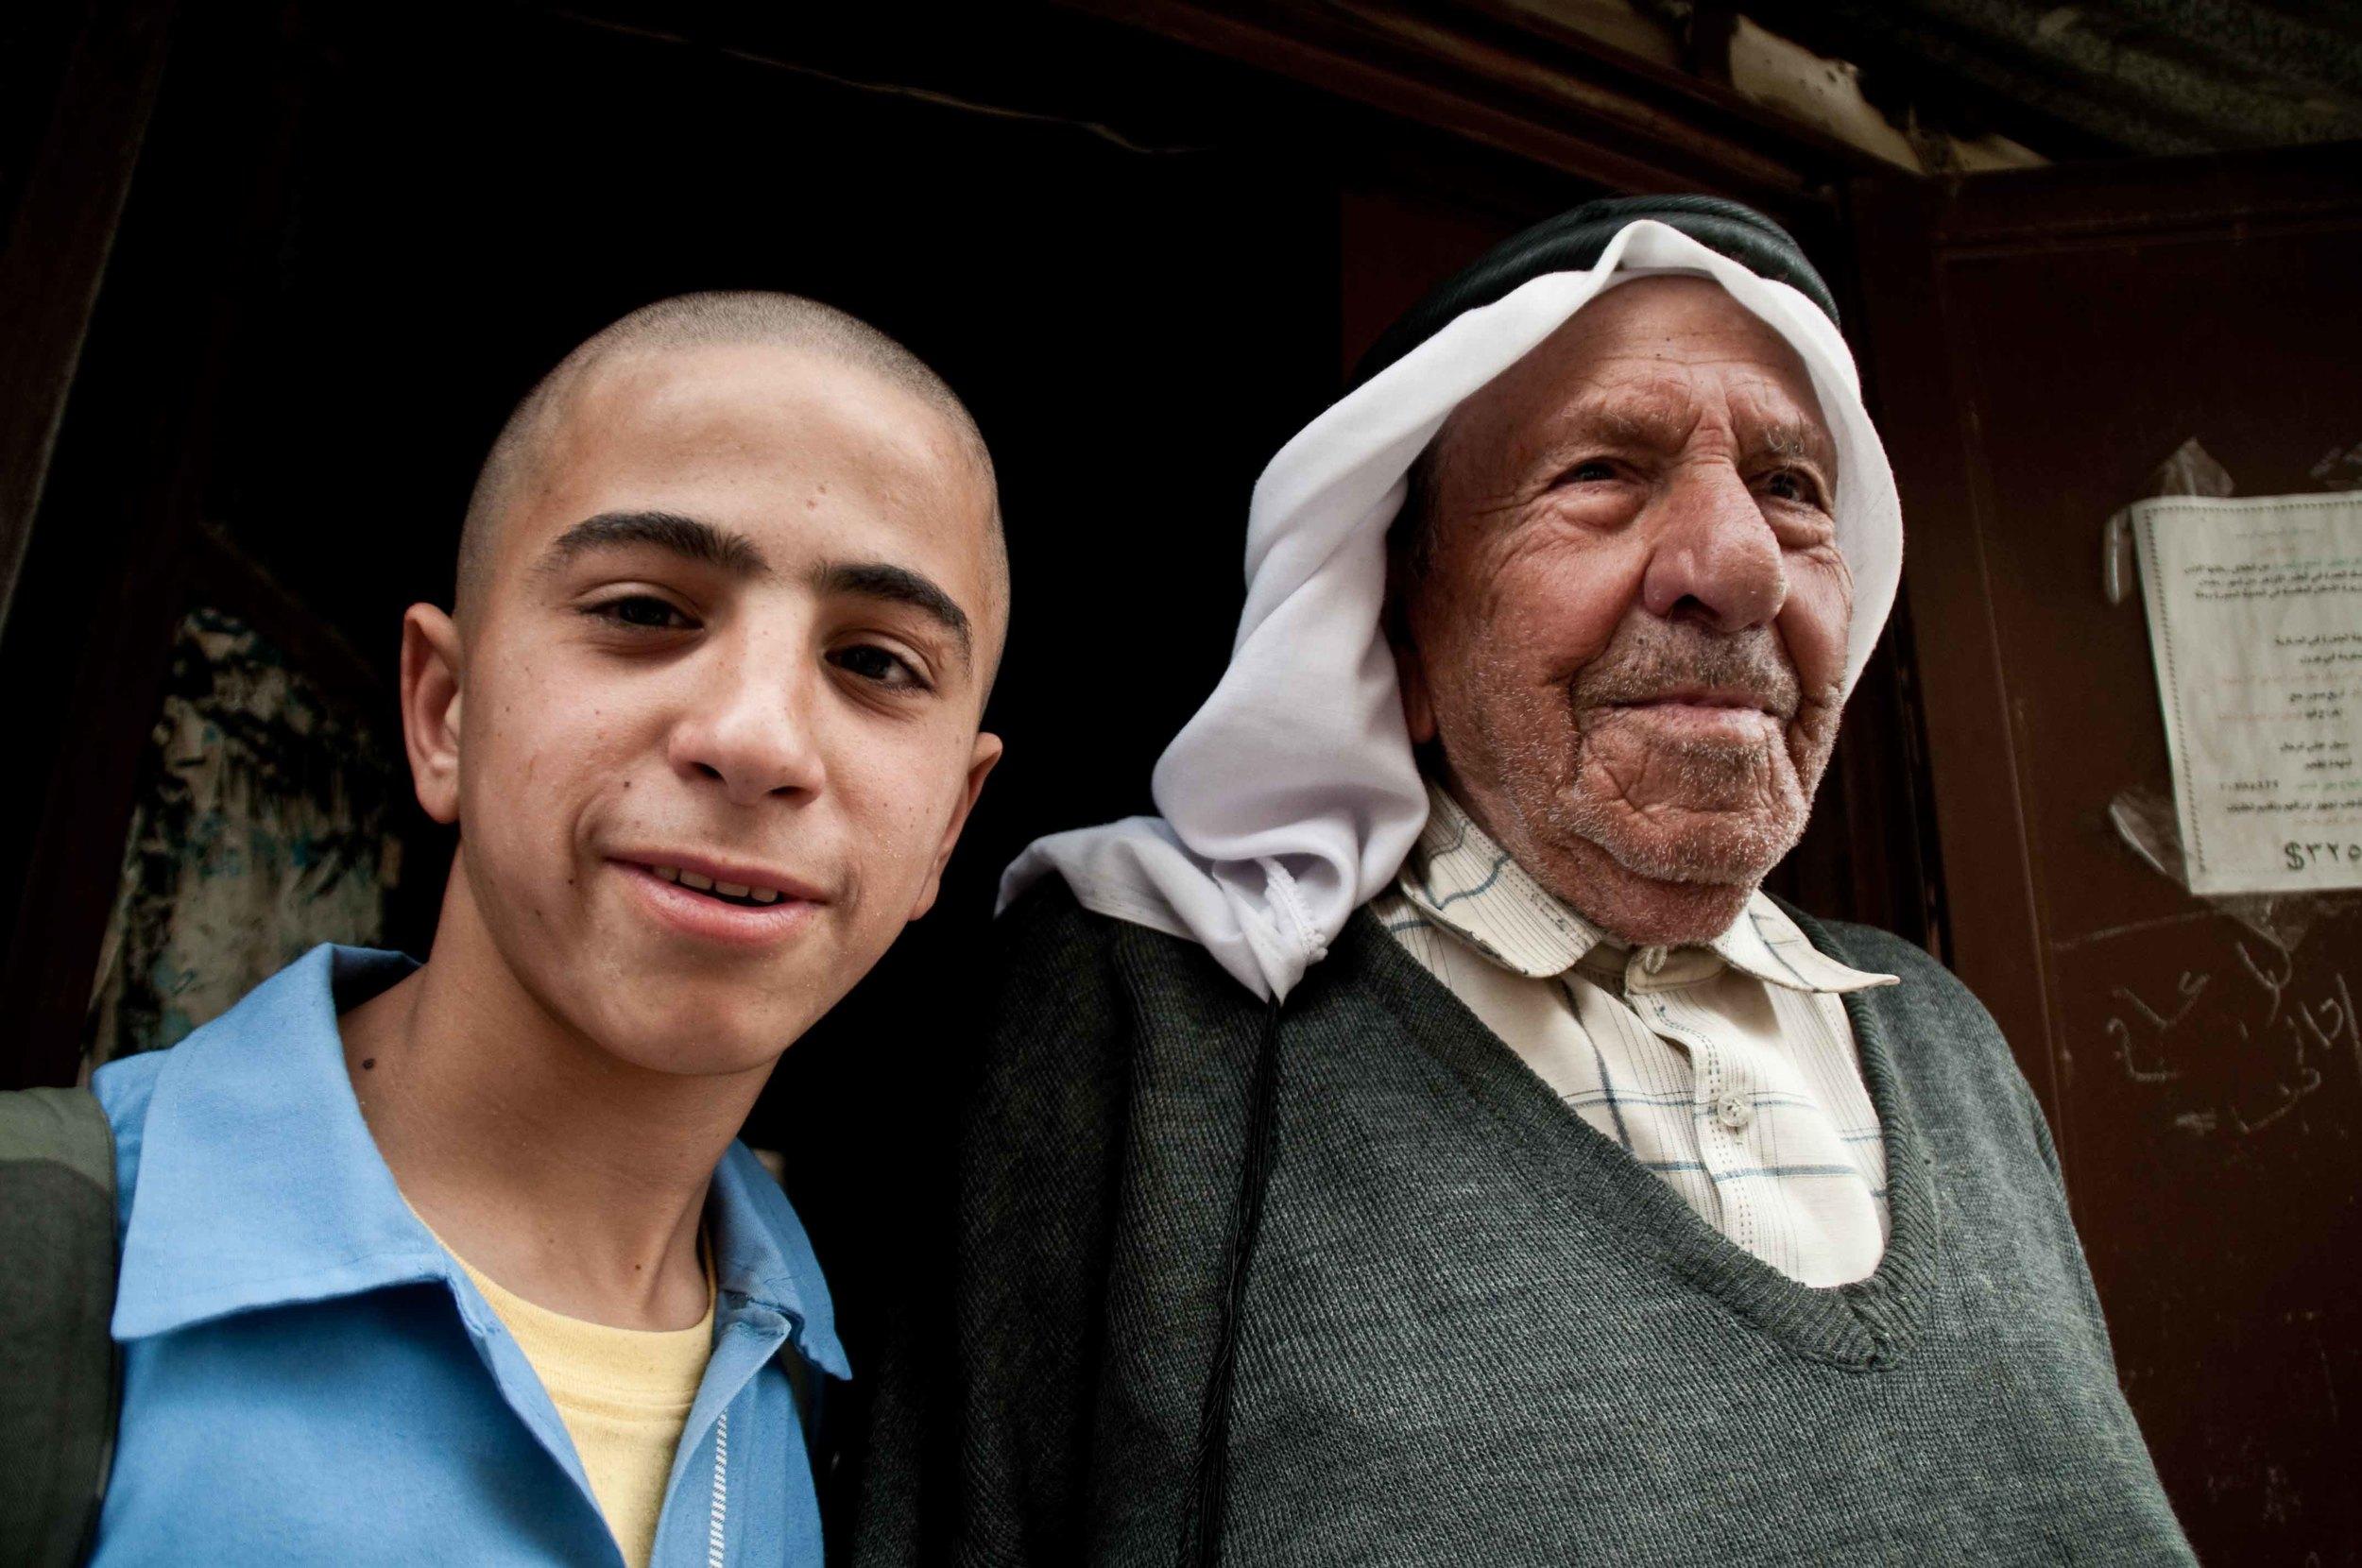 Lebanon_685.jpg